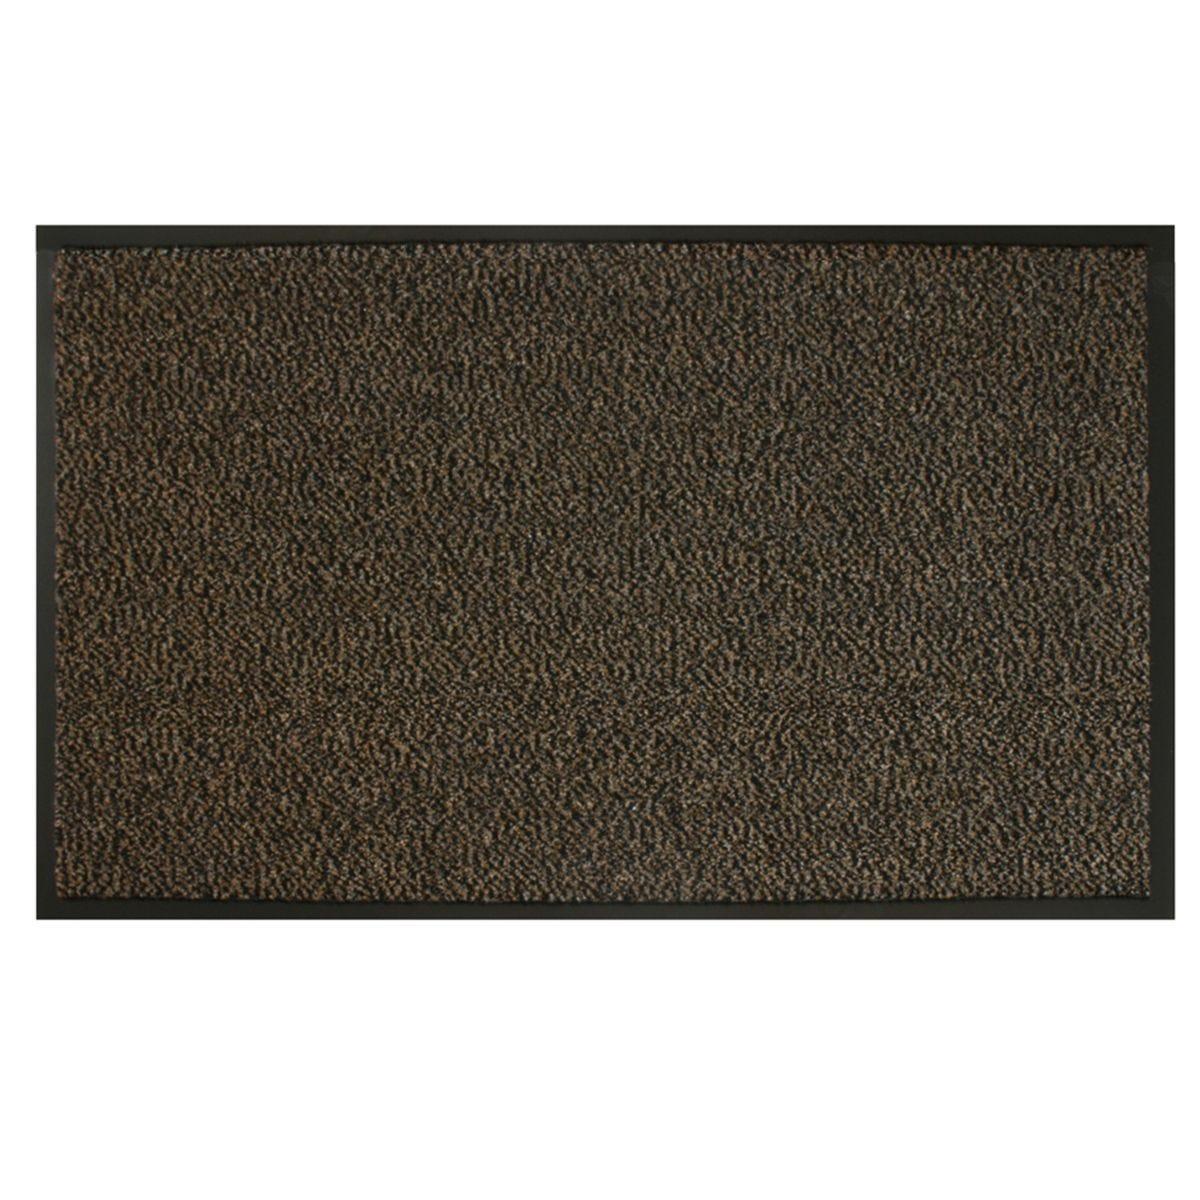 JVL 120x170cm Heavy Duty Commodore Doormat - Brown/Black